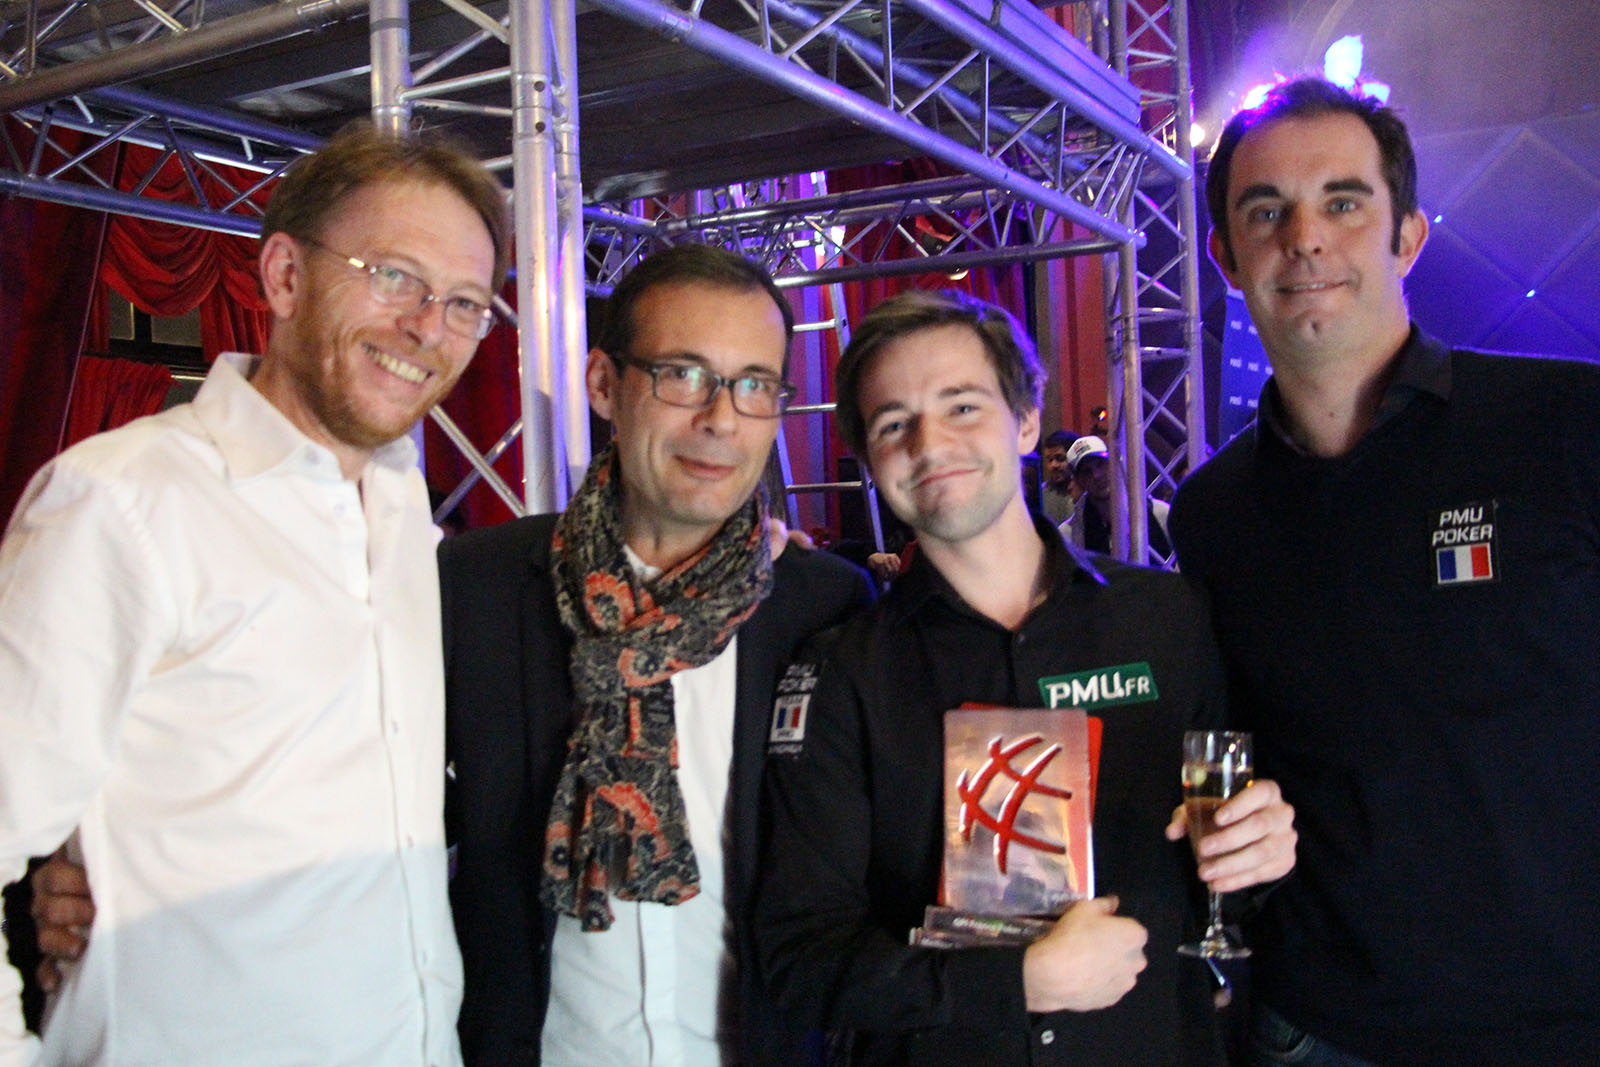 Erwann et le Staff PMU Poker !